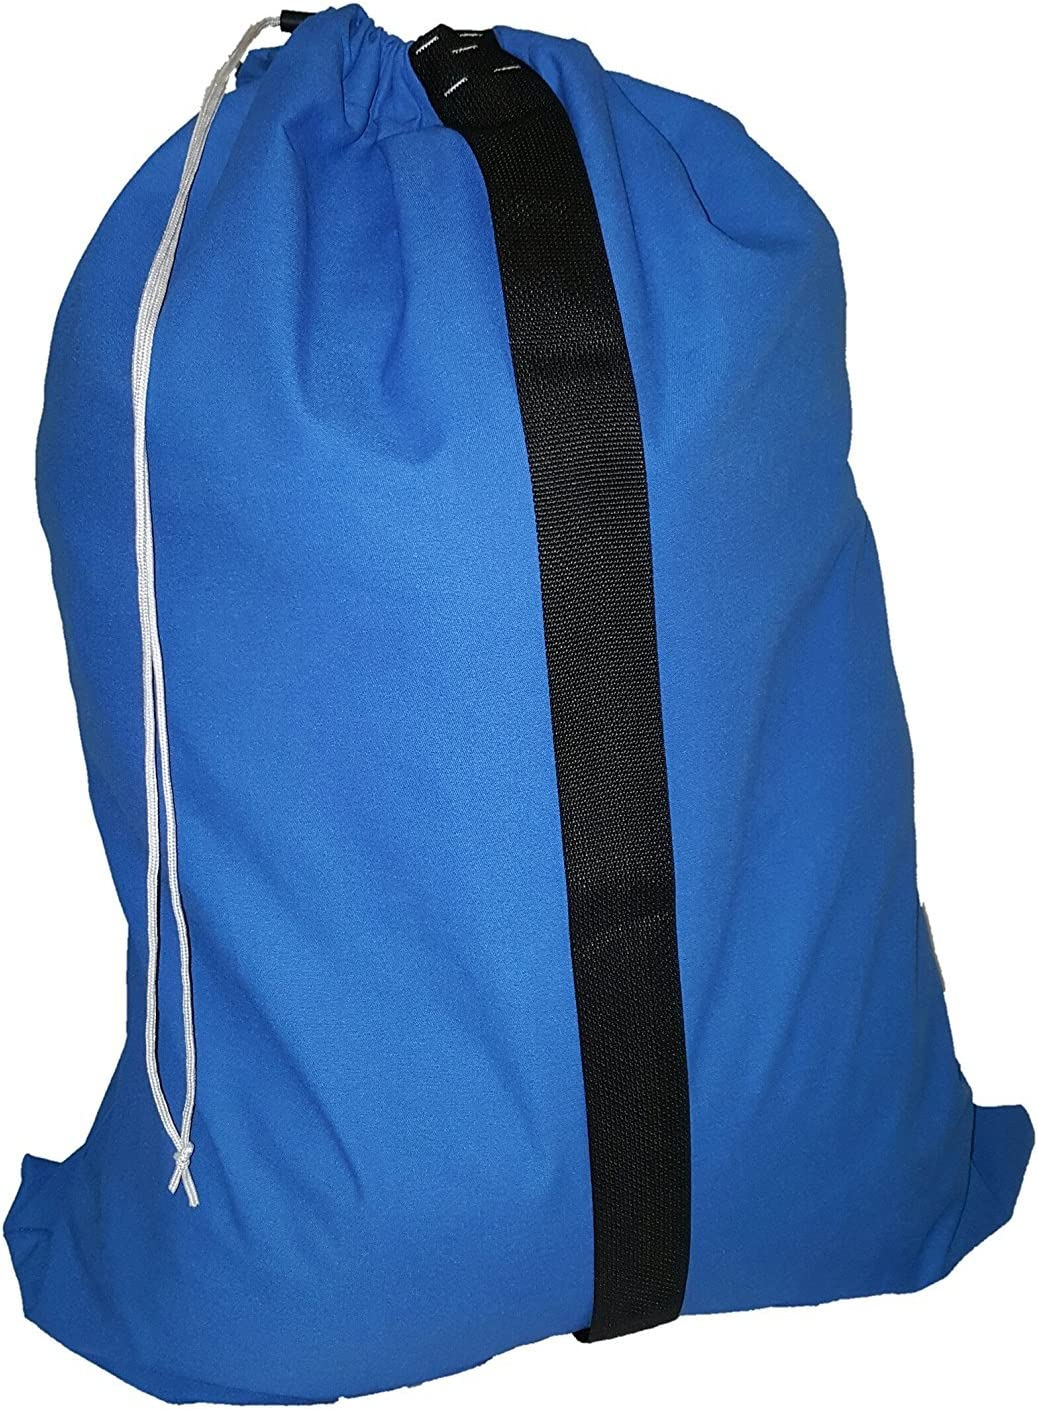 Owen Sewn Heavy Duty 30 X 40 Laundry Bag with Strap Blue